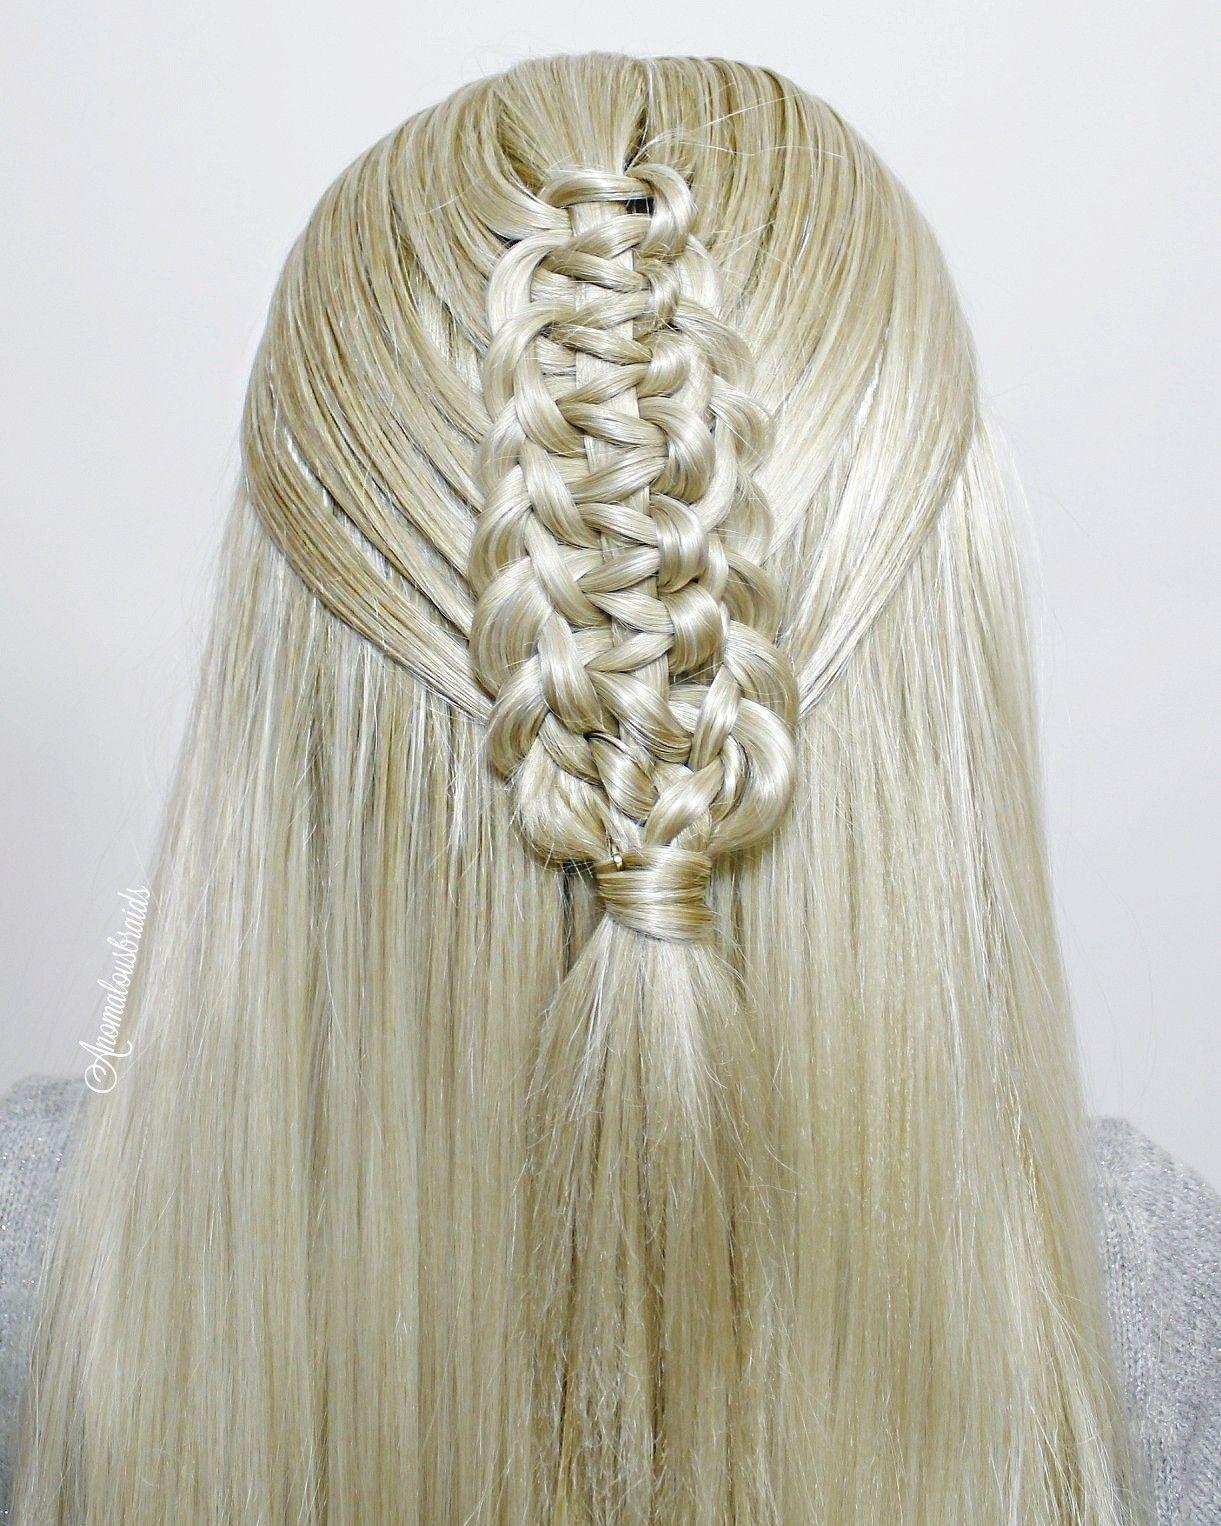 Pin By Ruth Christie On My Braids In 2020 Braids Hair Hair Styles